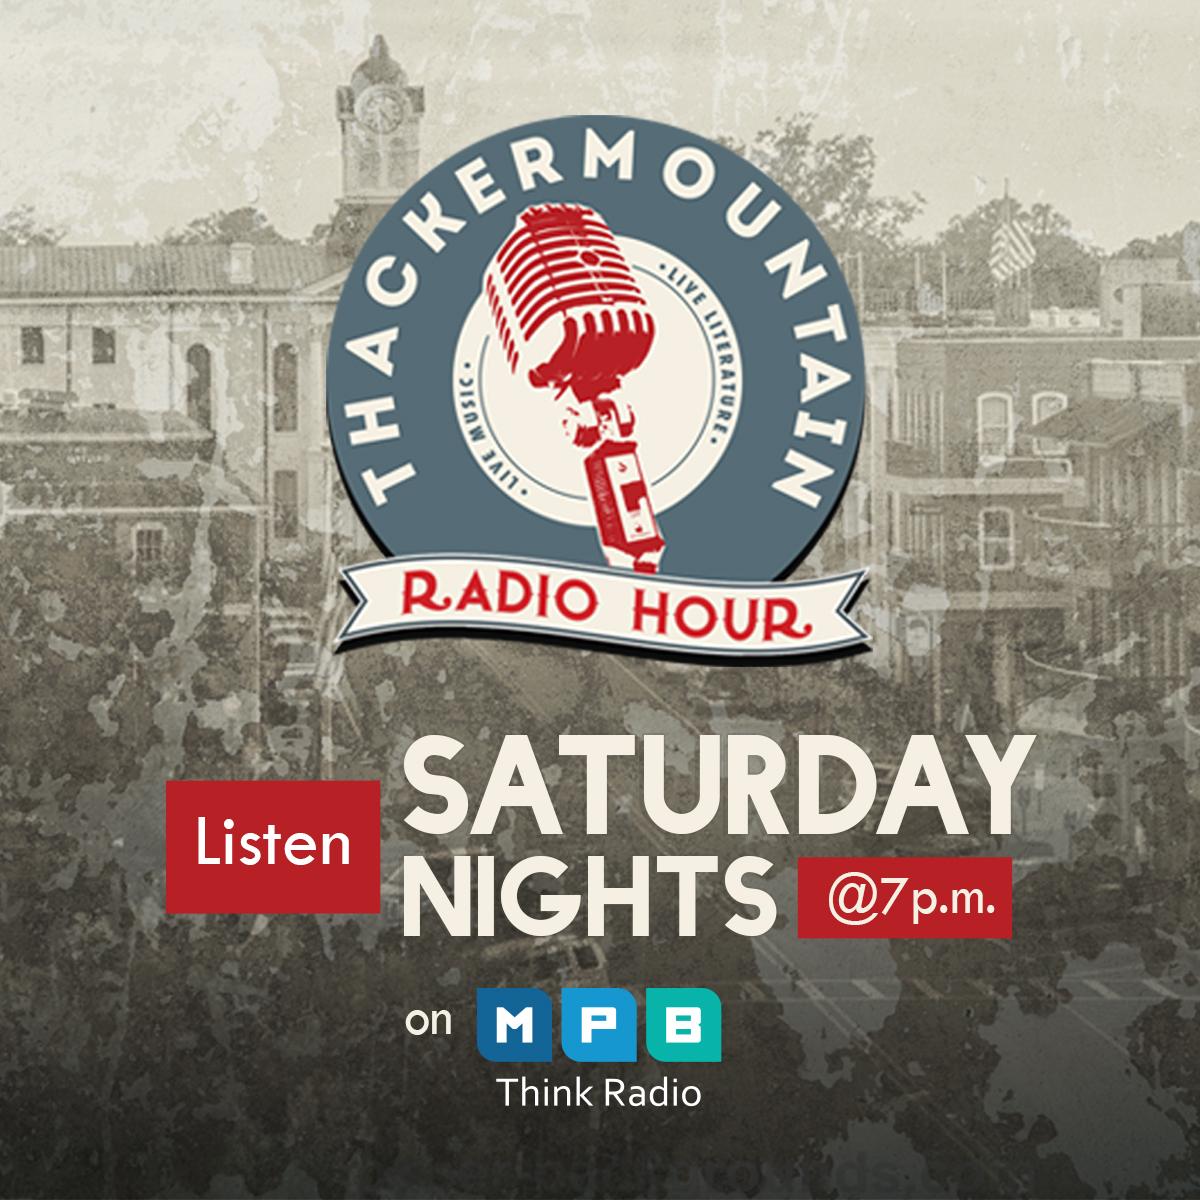 Listen to Thacker Mountain Radio Hour on Saturdays at 7 p.m. on MPB Think Radio